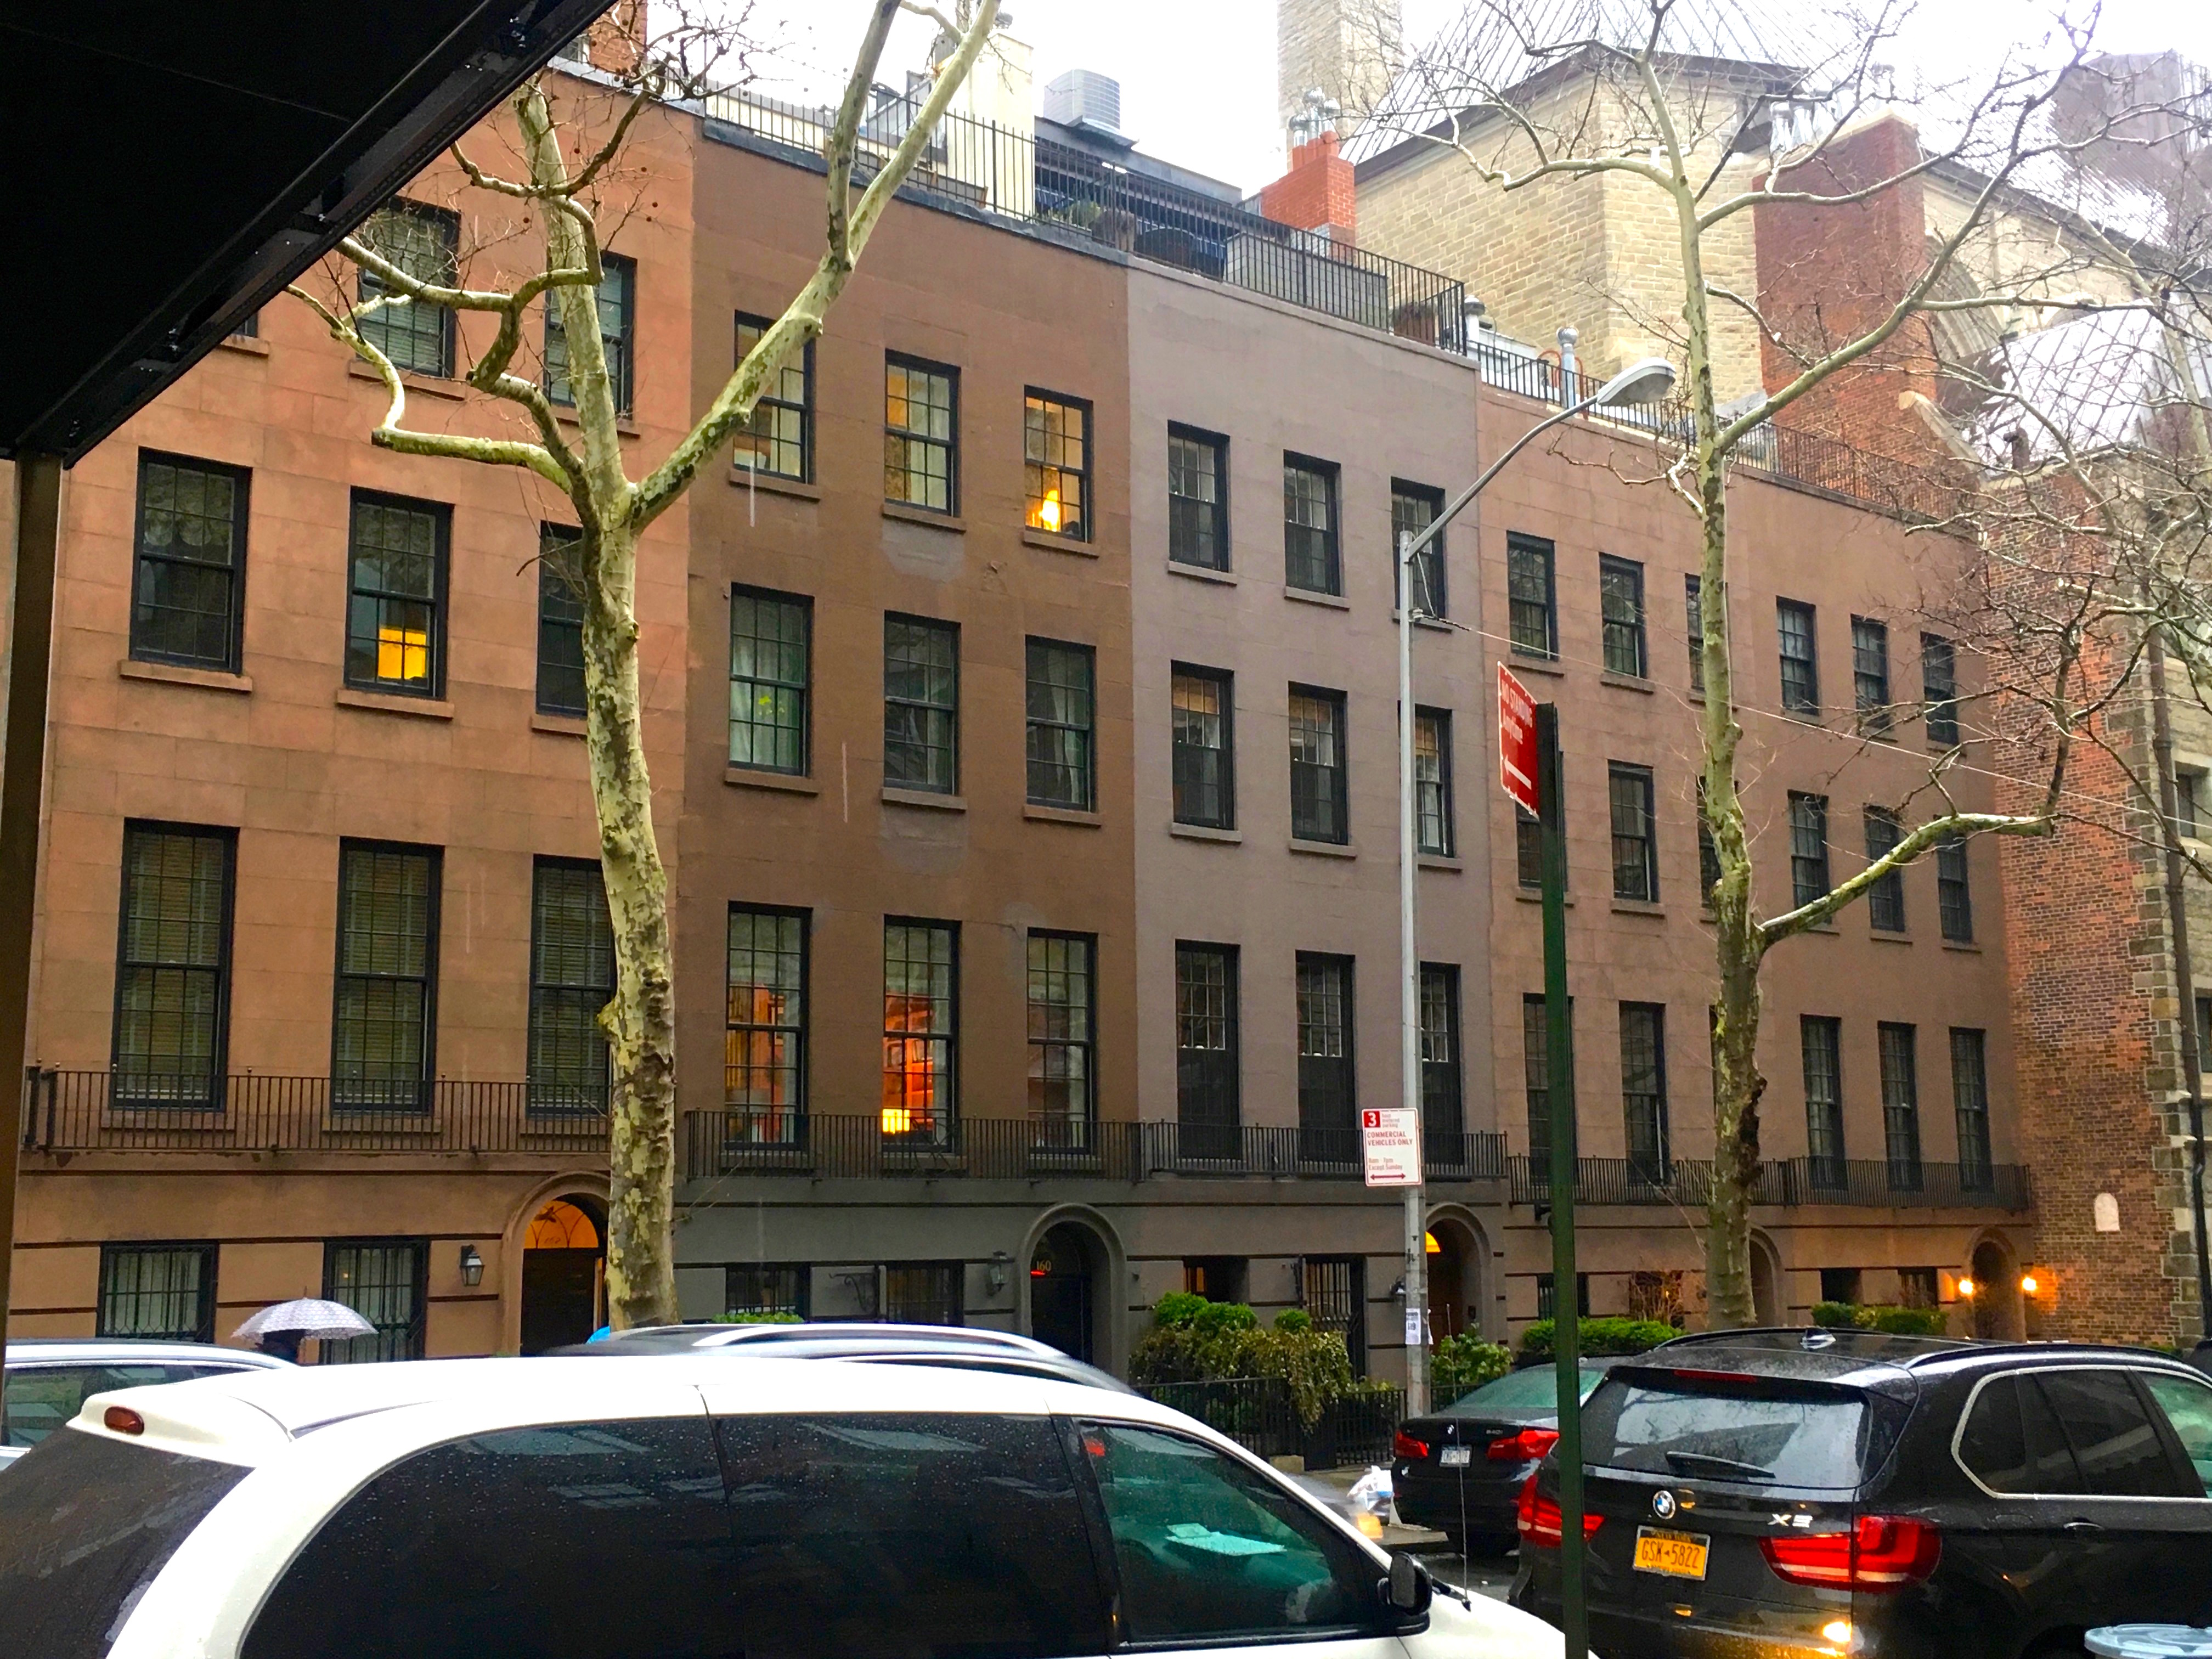 Jones Wood Garden 66th Street | Ephemeral New York